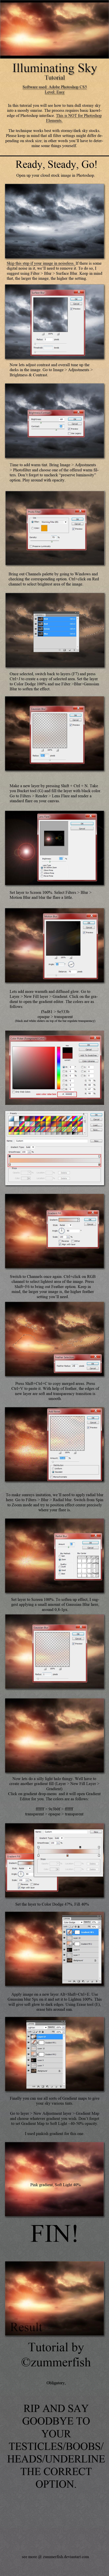 Illuminating Sky (tutorial) by zummerfish